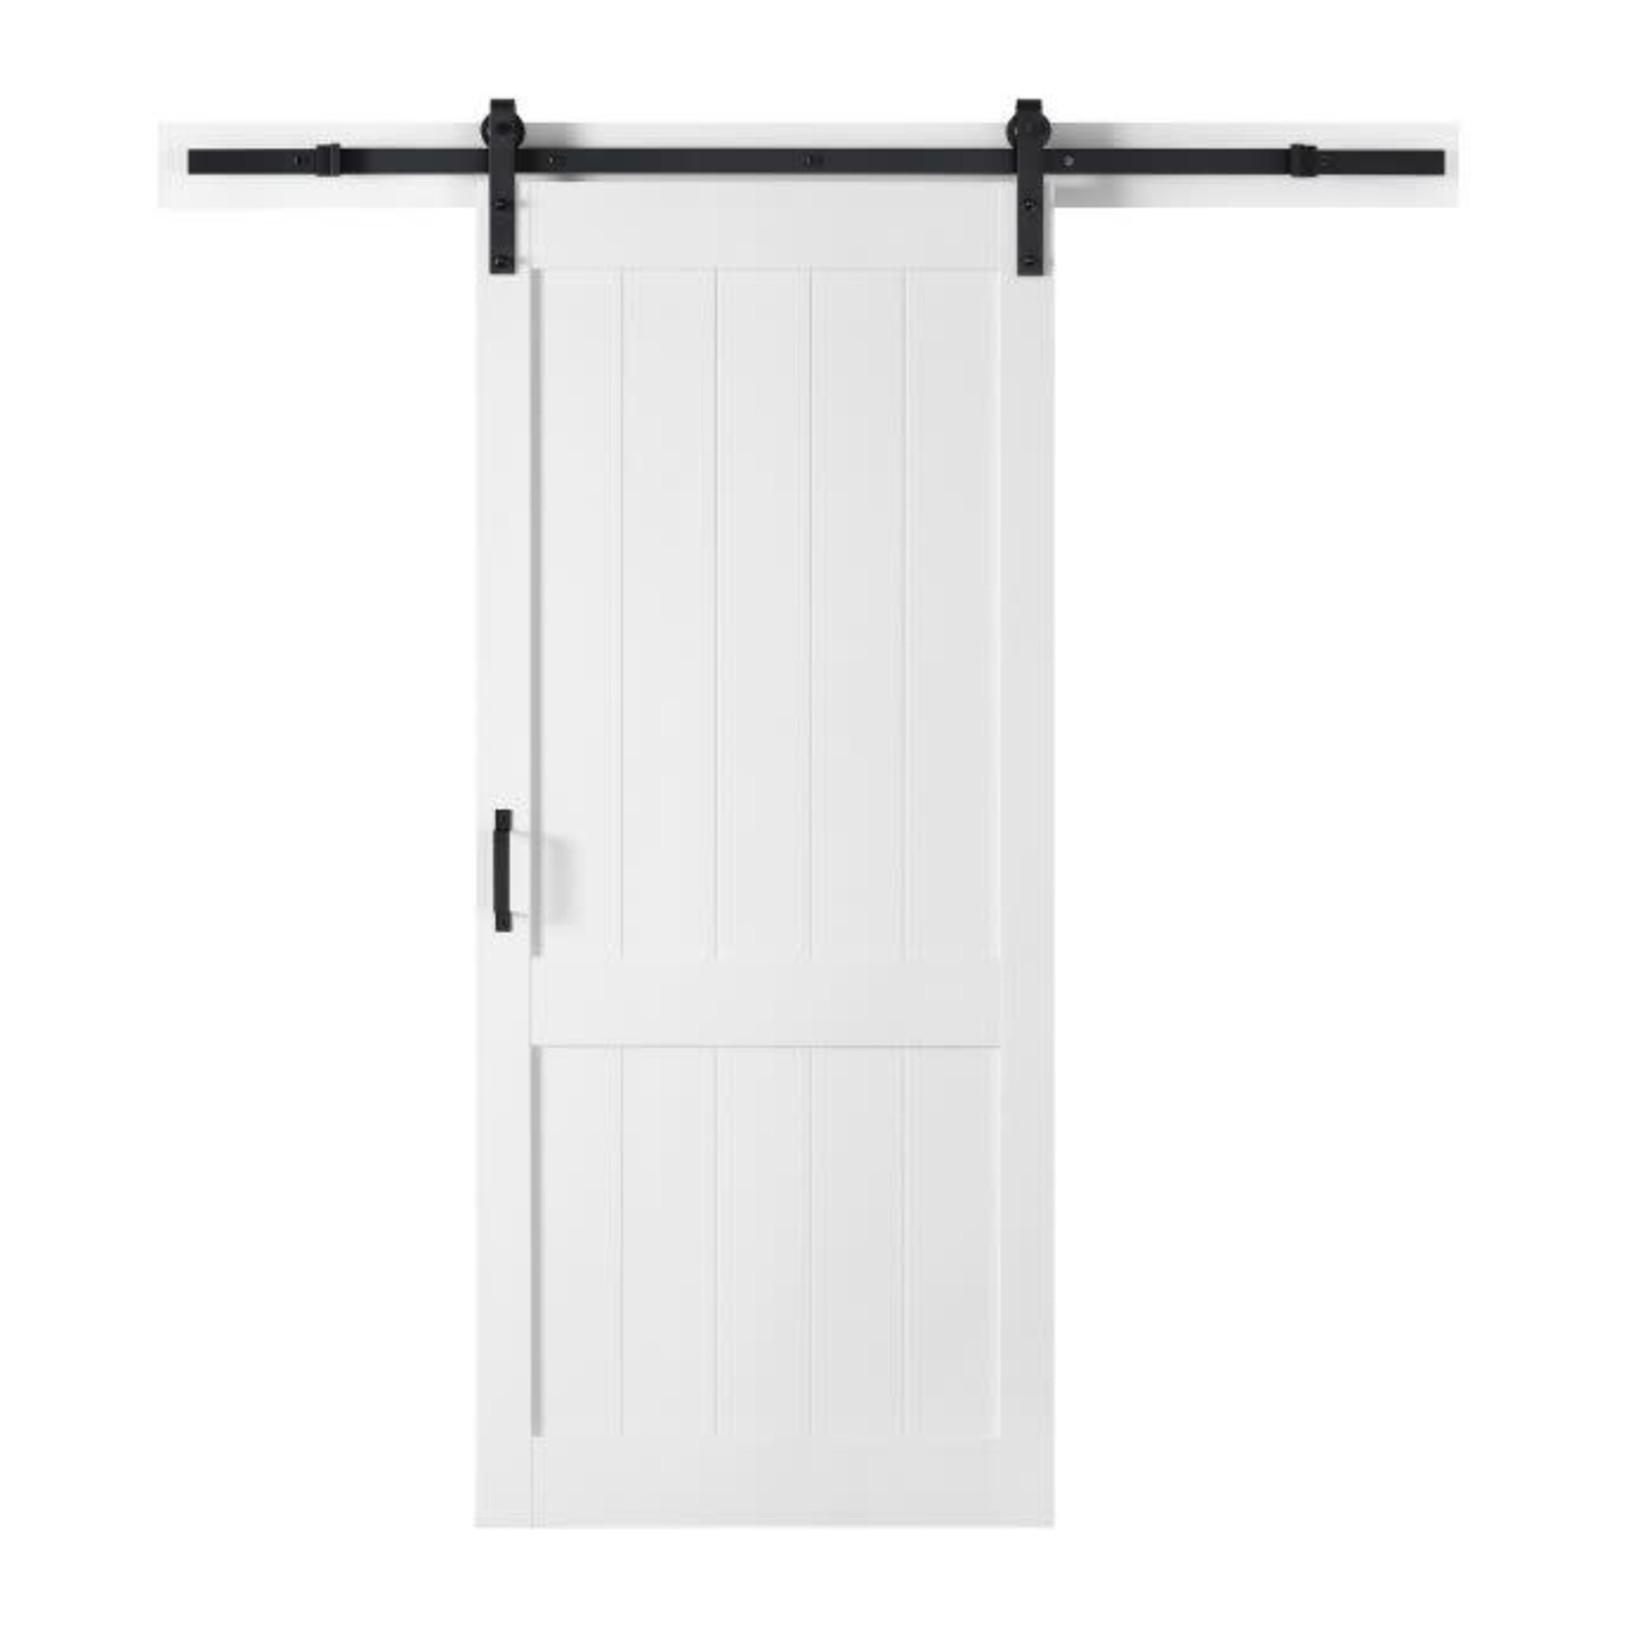 Porte de grange Ove Homestead 104JS 36x84 Textured White